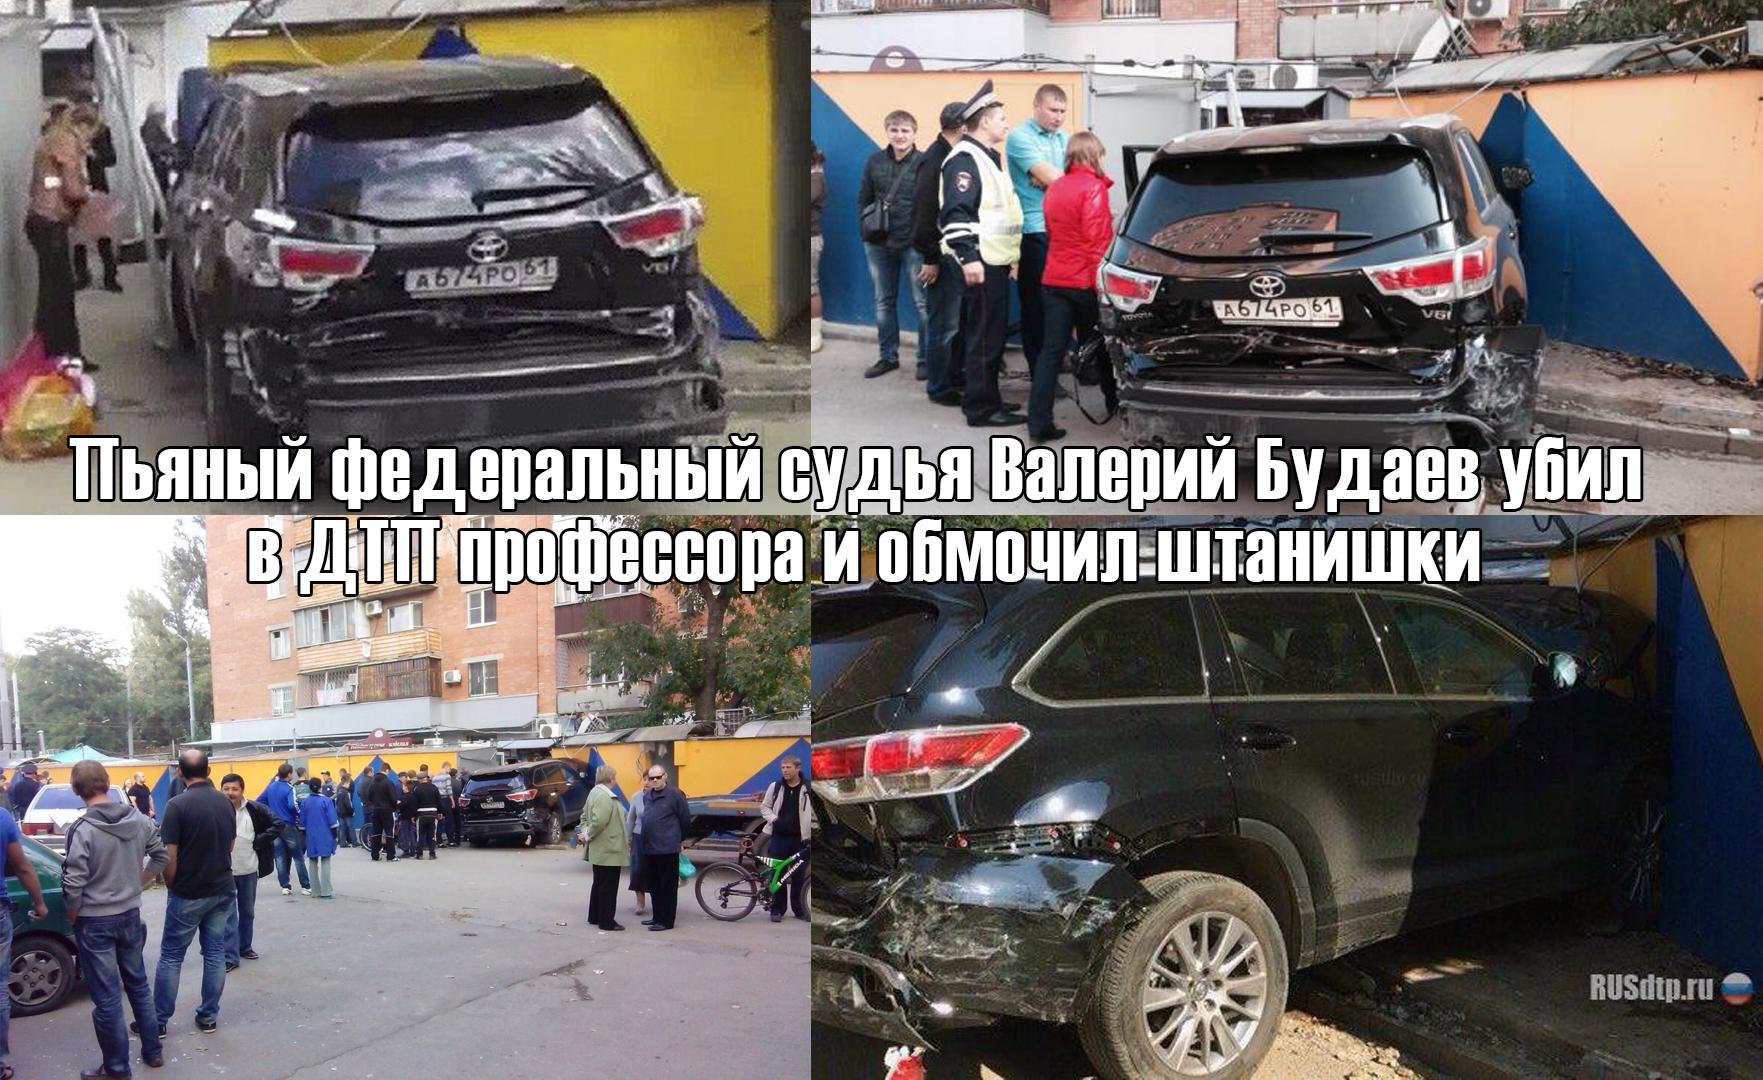 коллаж фед.судья ДТП